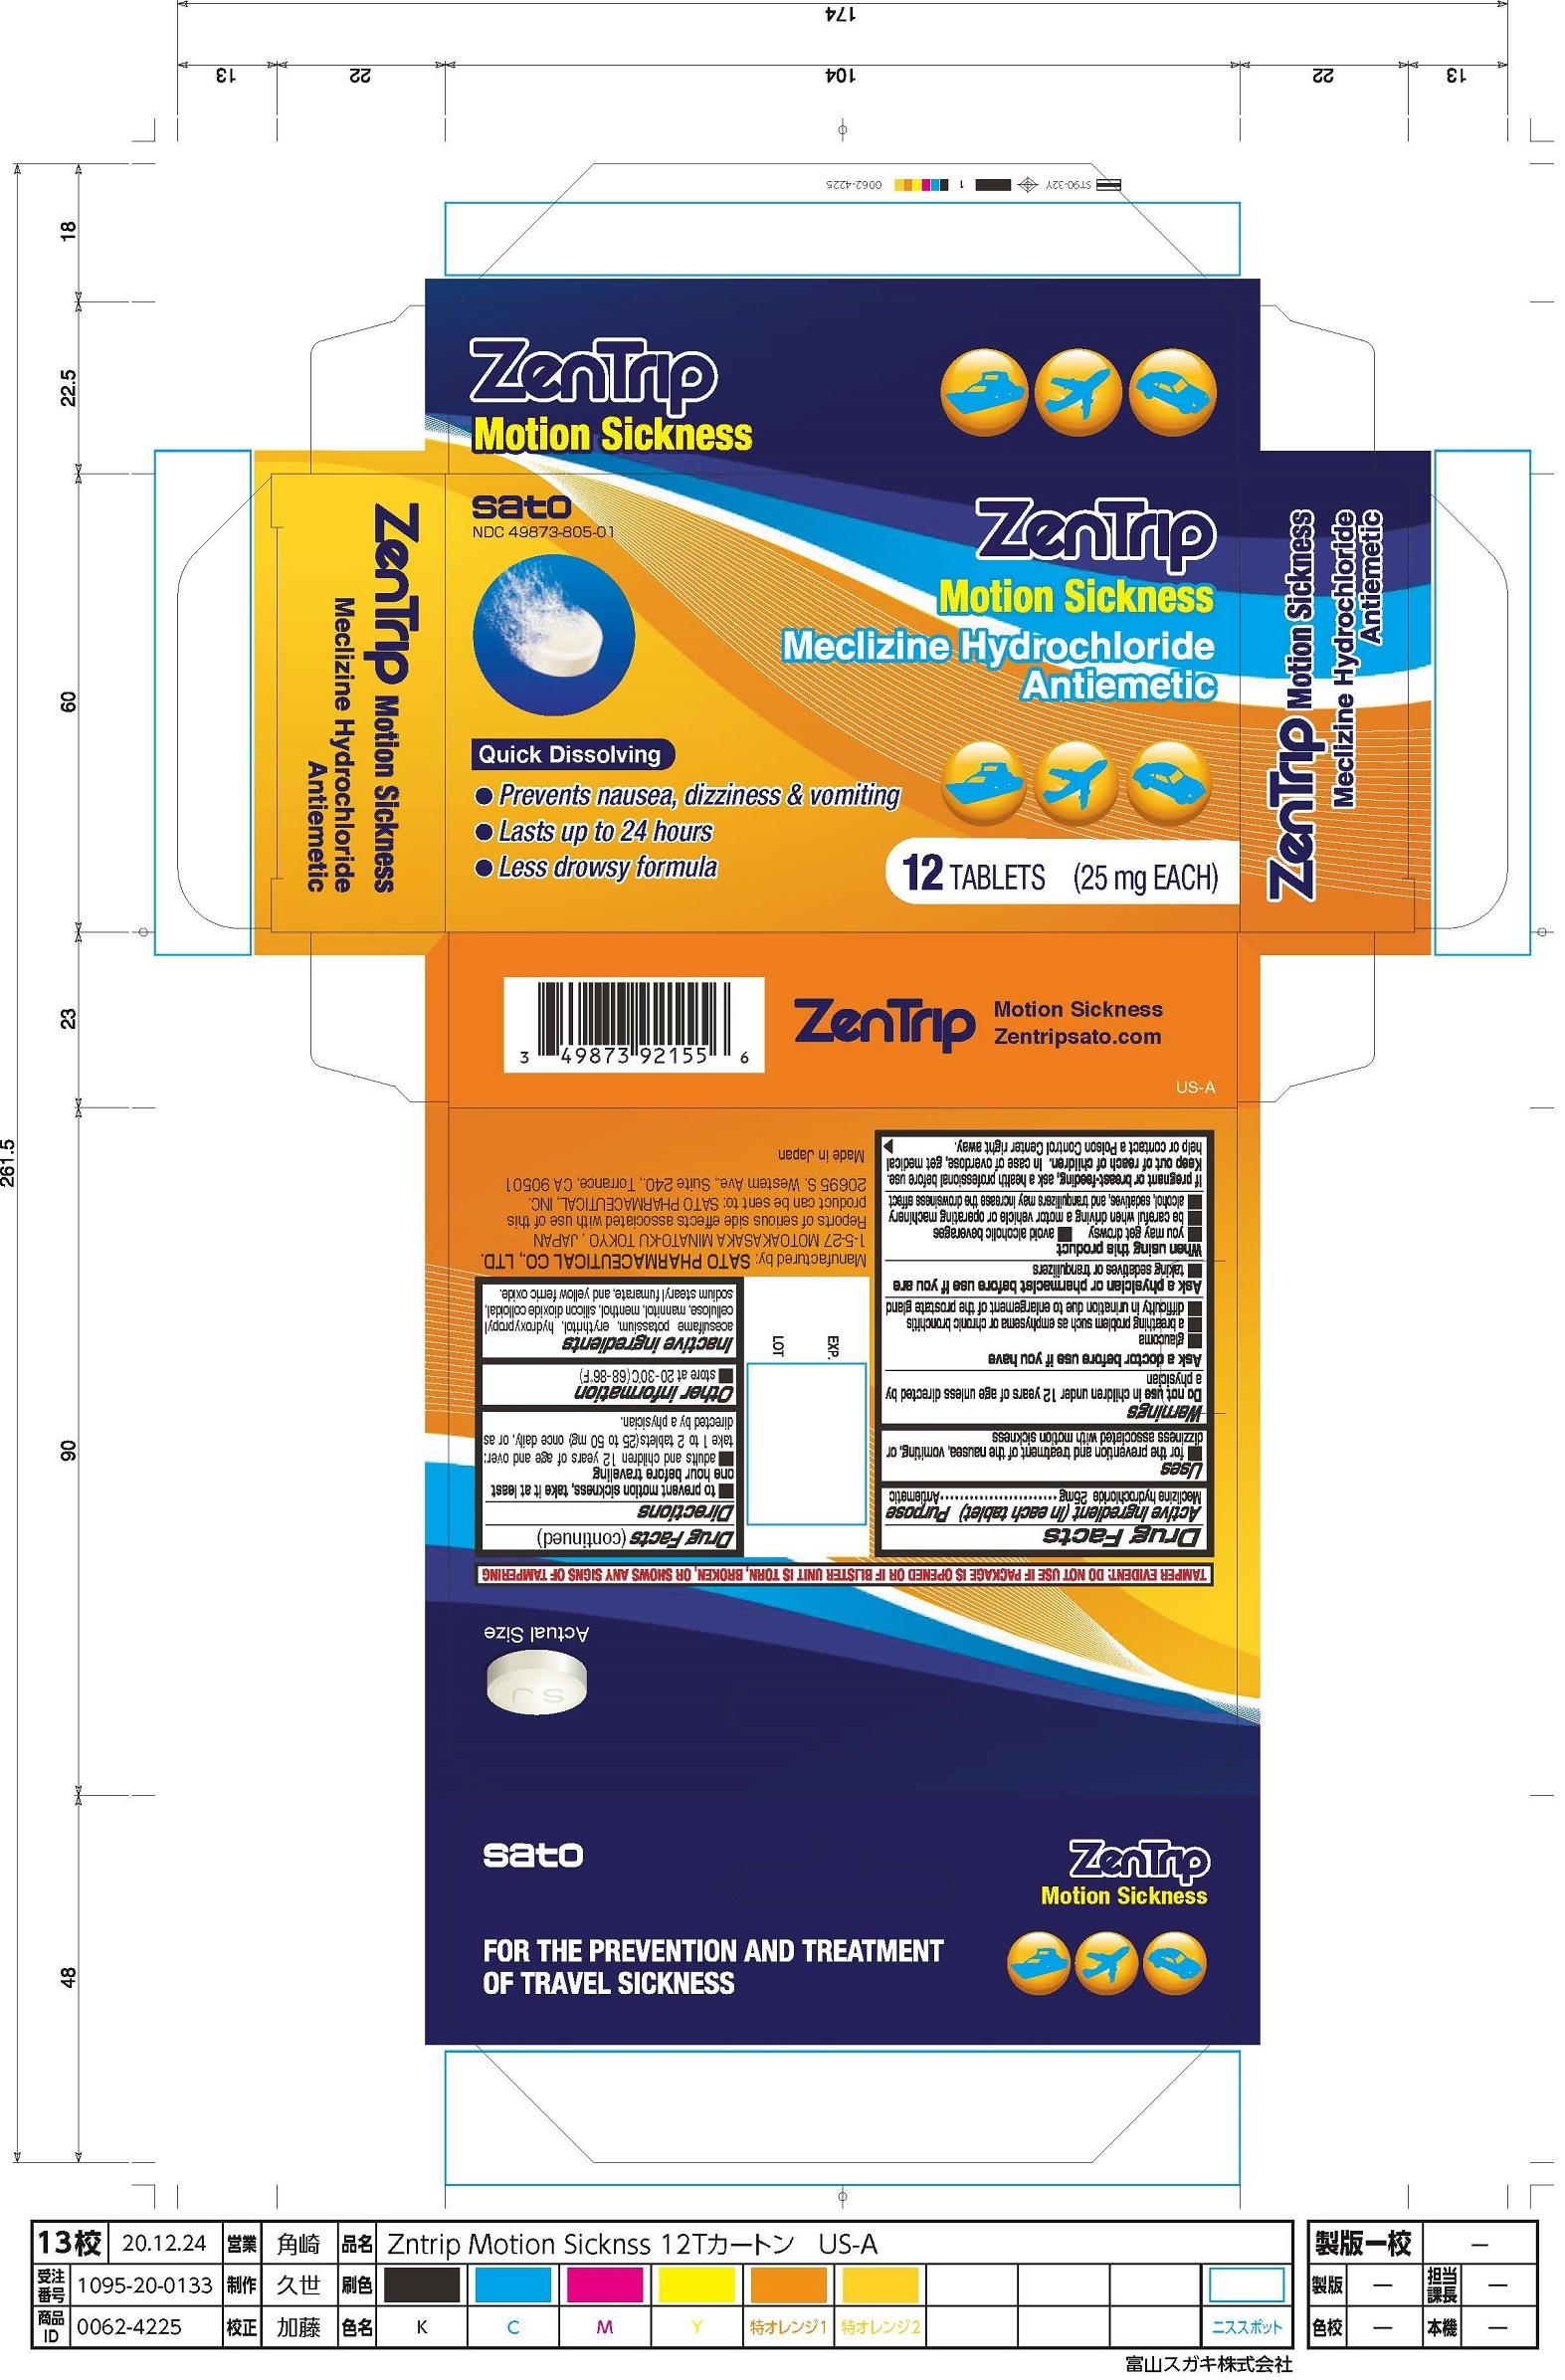 ZenTrip Motion Sickness - 12Tablets